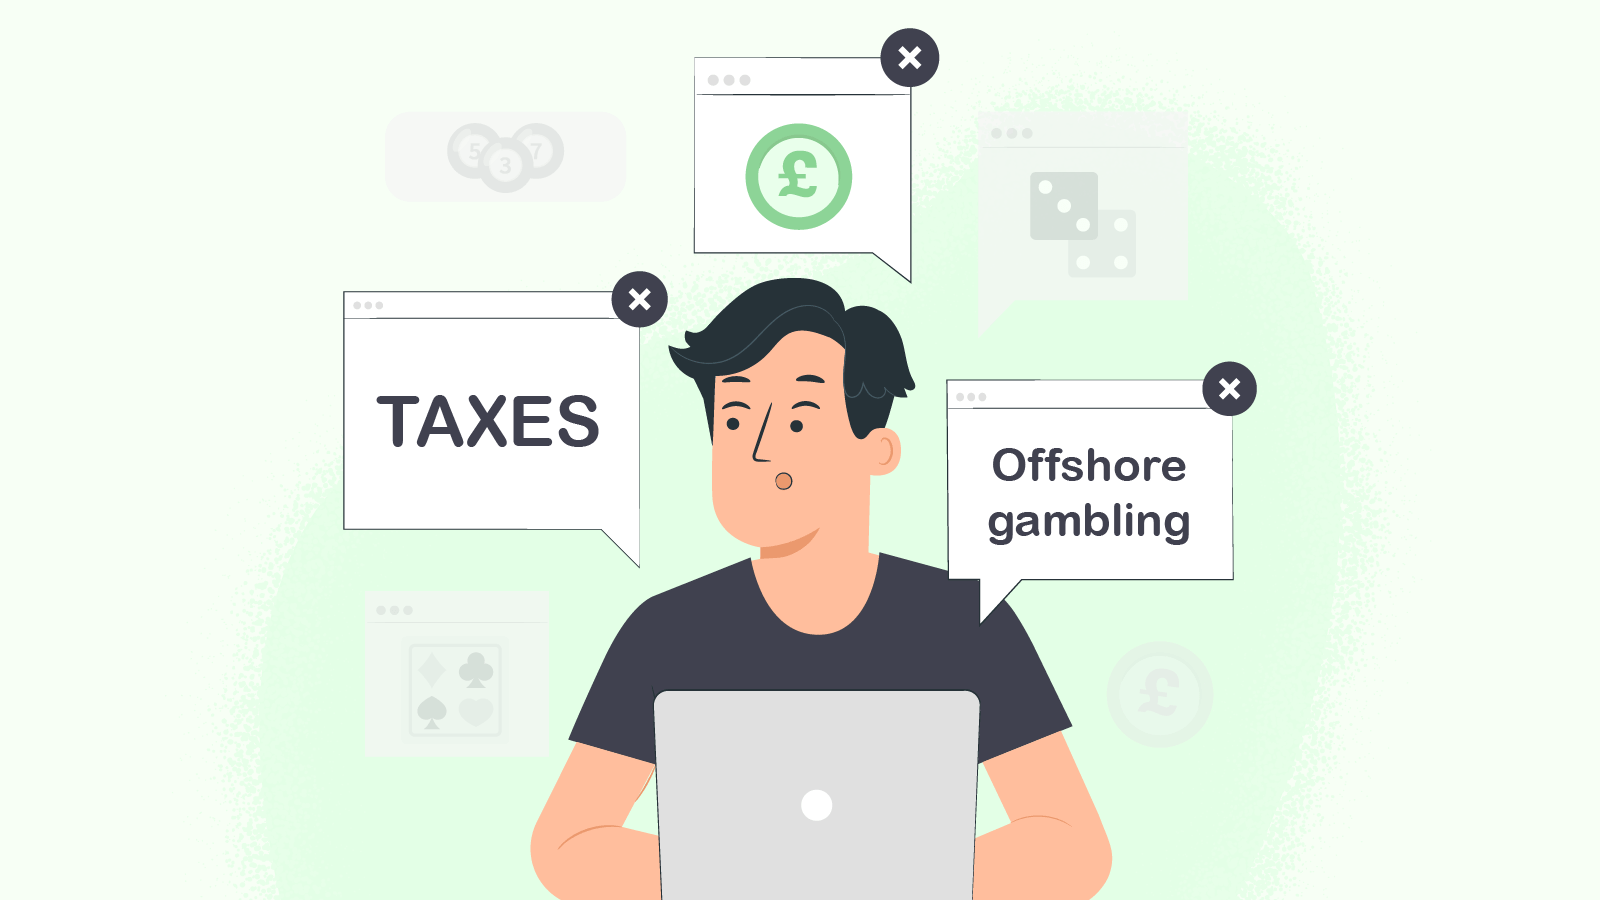 Offshore gambling taxes